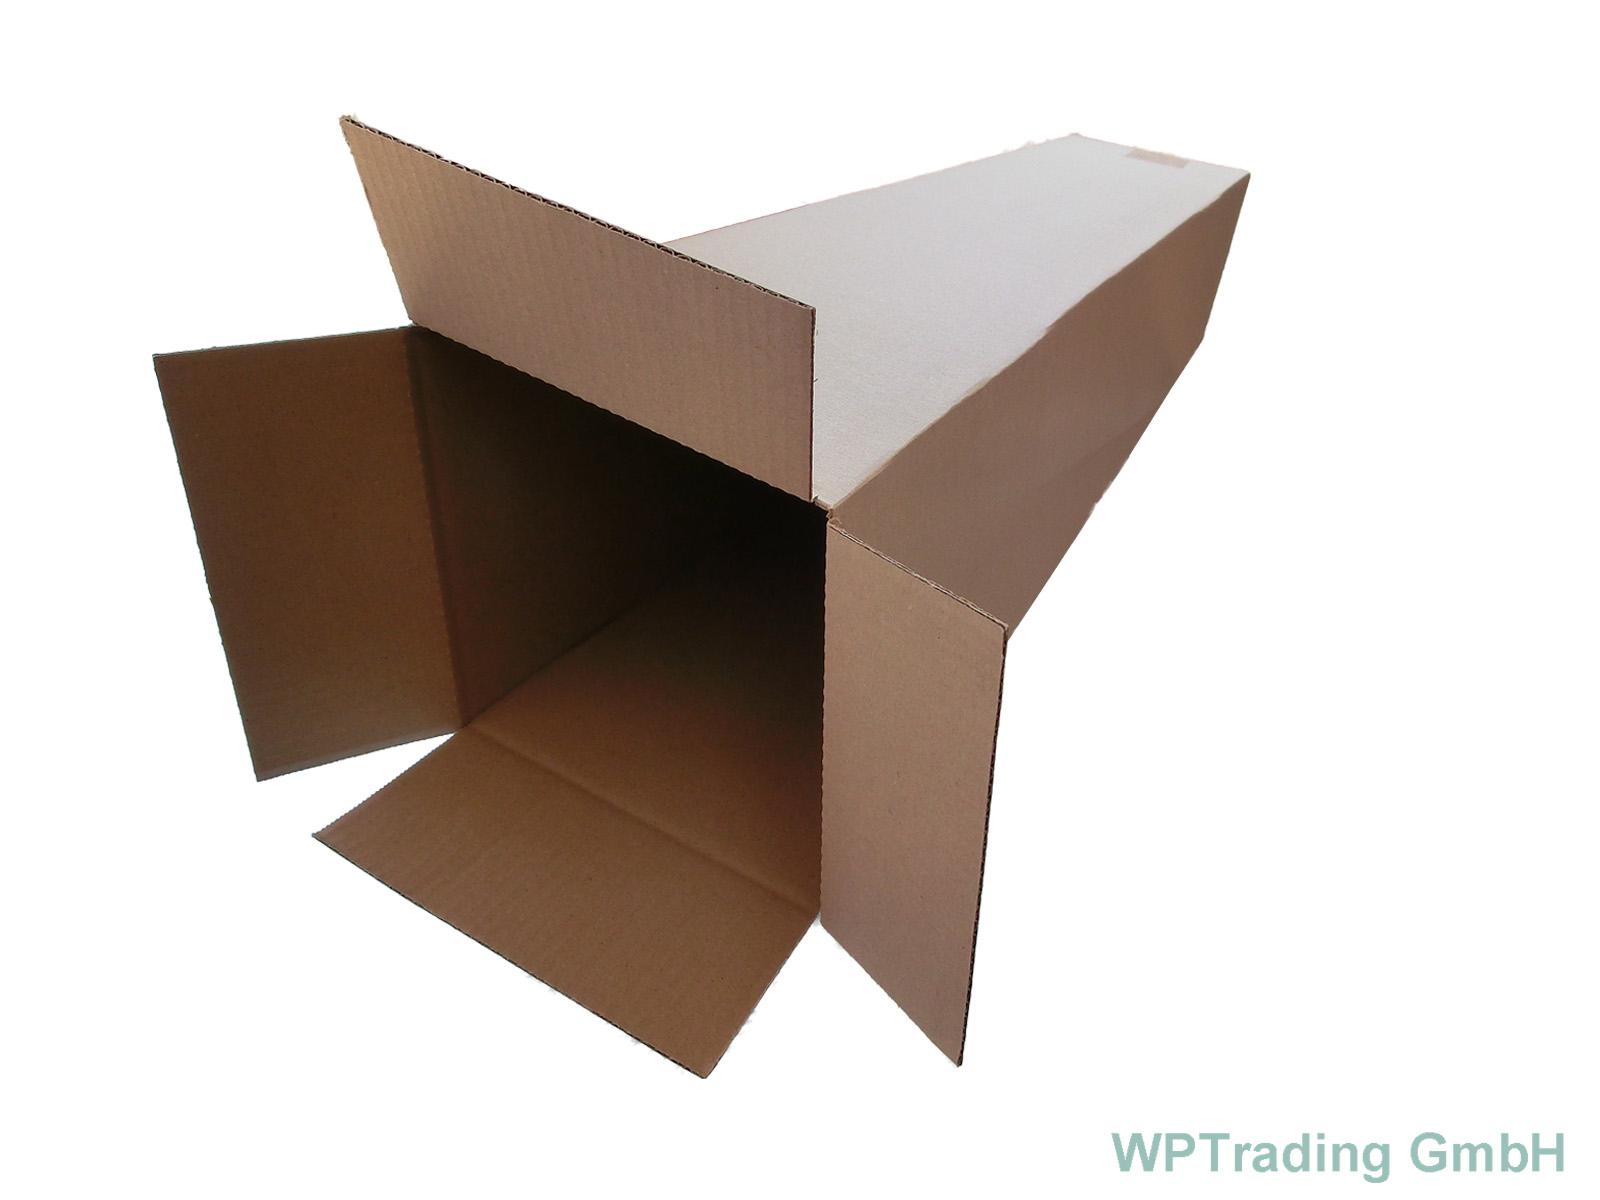 versand-kartons dpd national paketmaße xs, s, m, l, xl - einfach